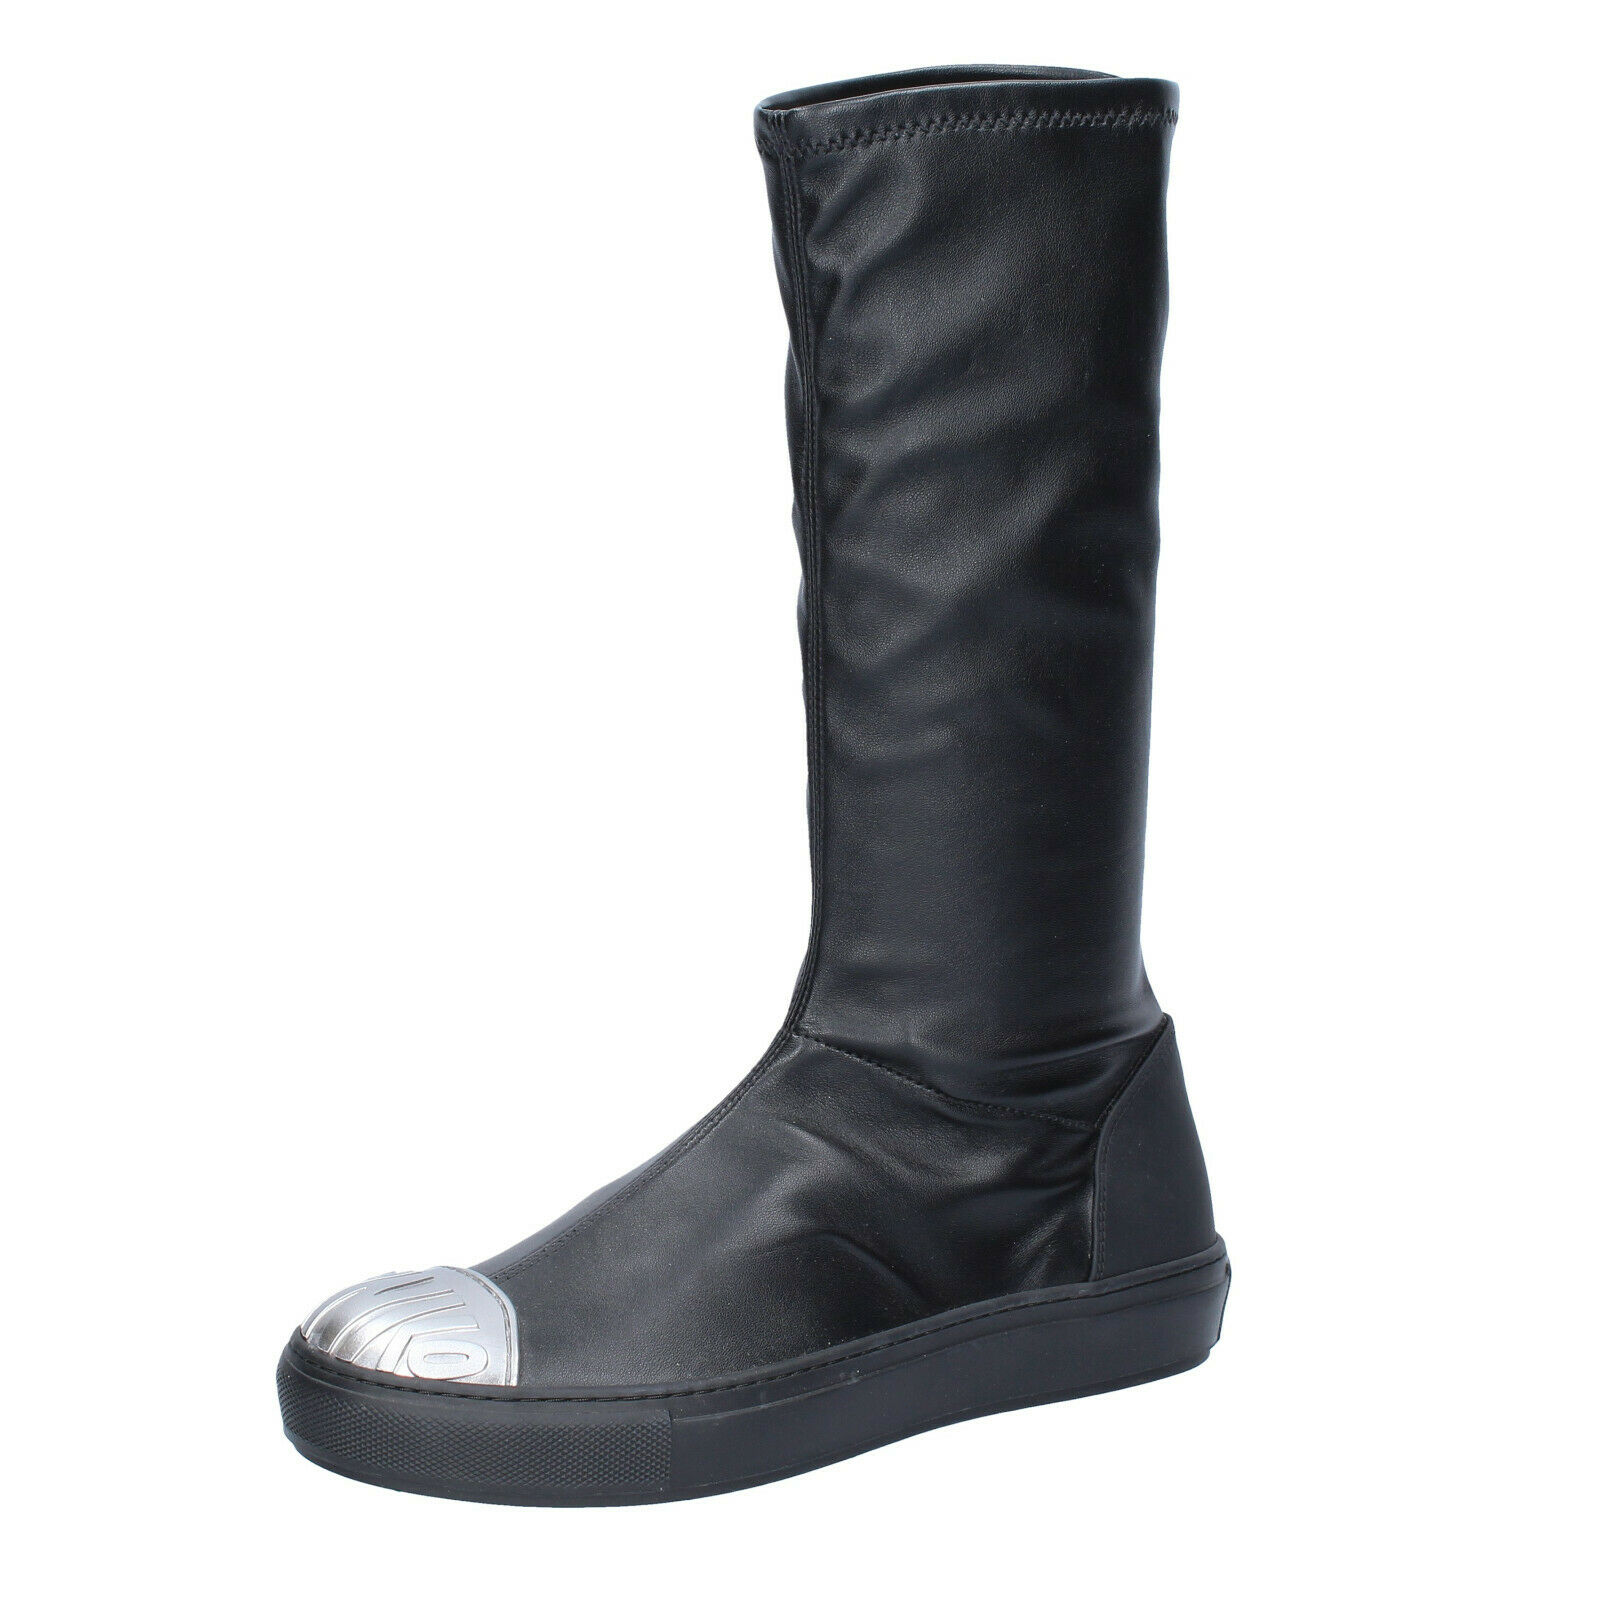 Chaussures femmes roseO 37 UE Bottes Noir Cuir bs276-37